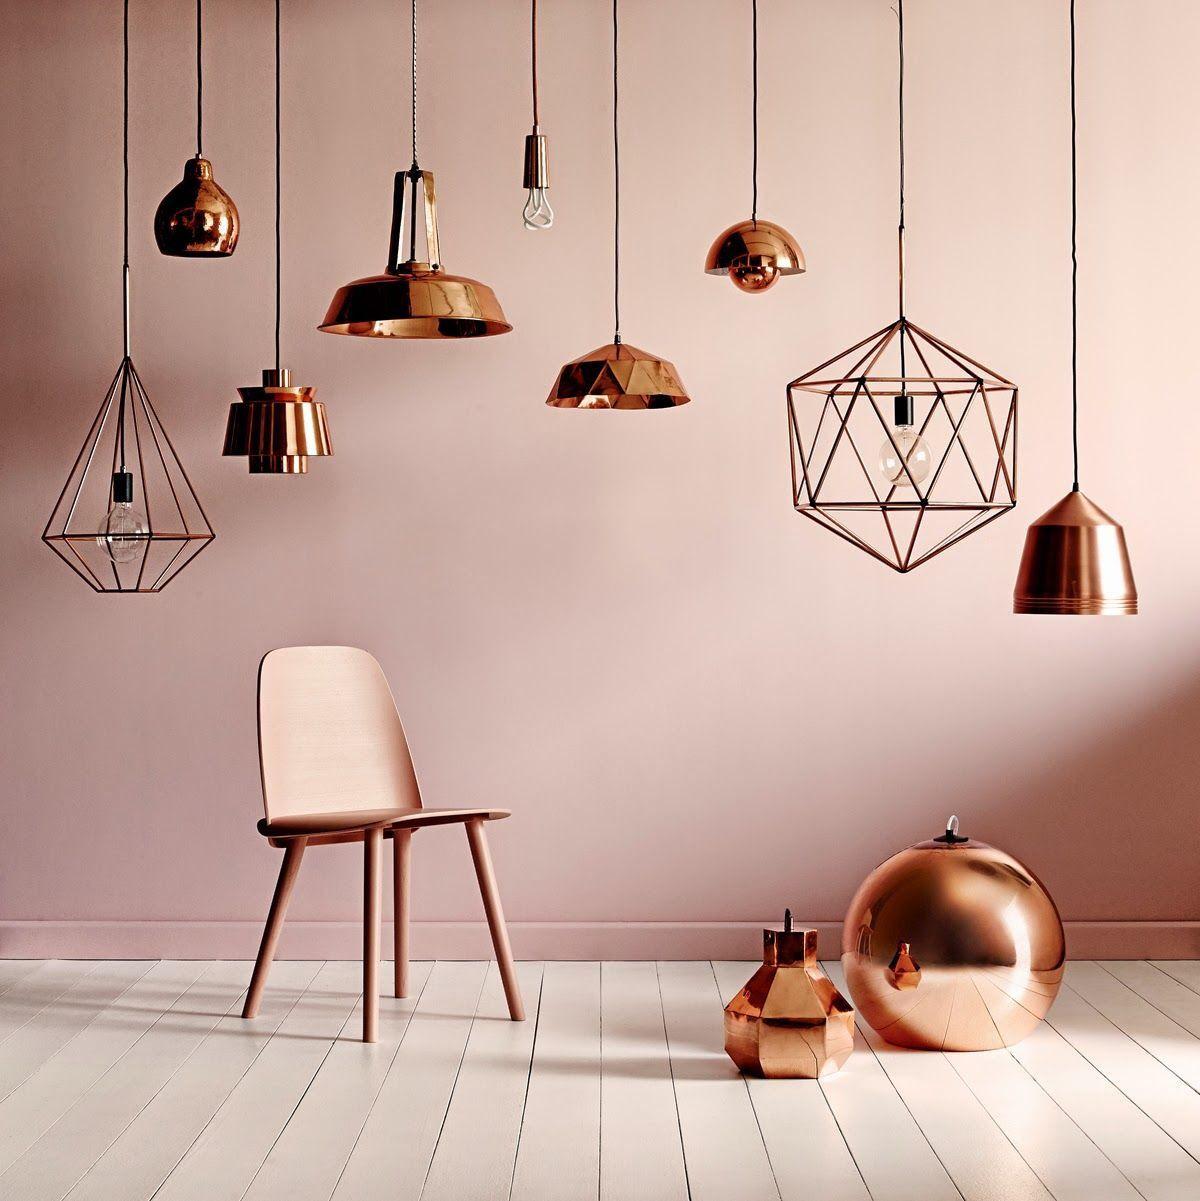 15 Stylish Room Decorating Ideas Reflecting Modern Interior Design